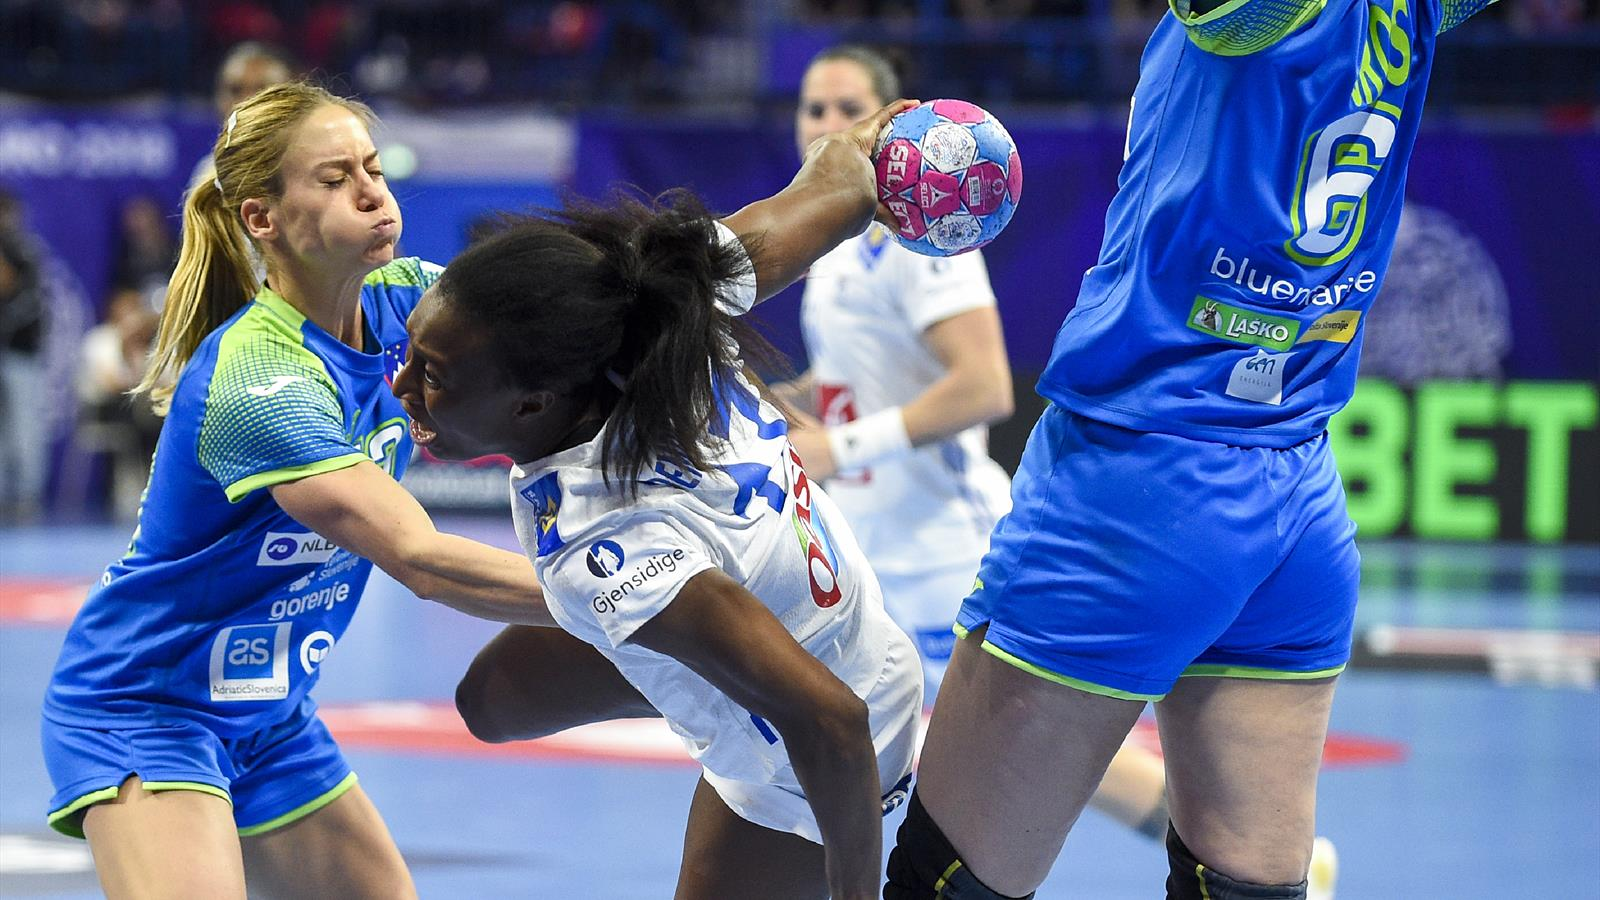 Handball Wm Zeitplan